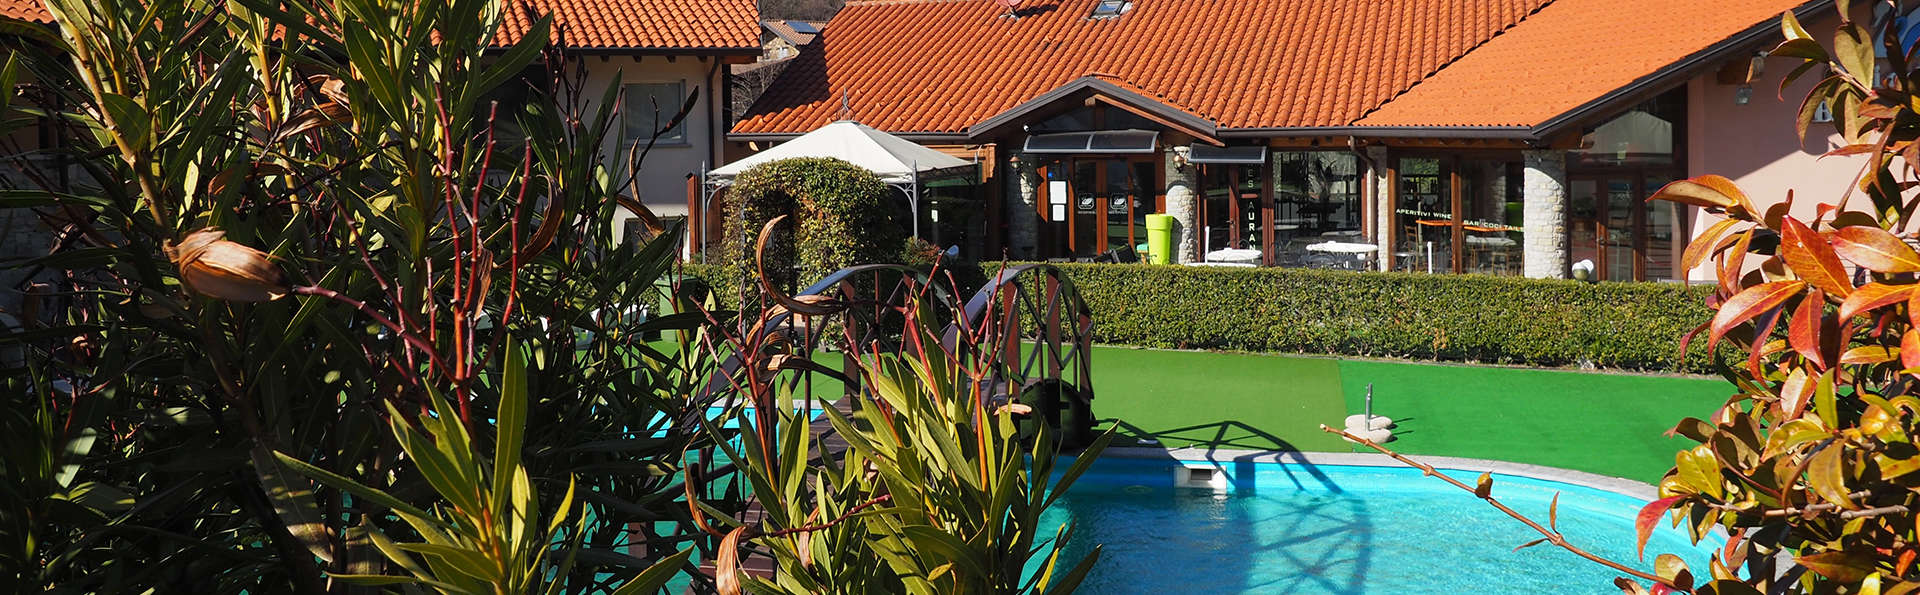 Residence Oasi Dei Celti - Edit_Front.jpg